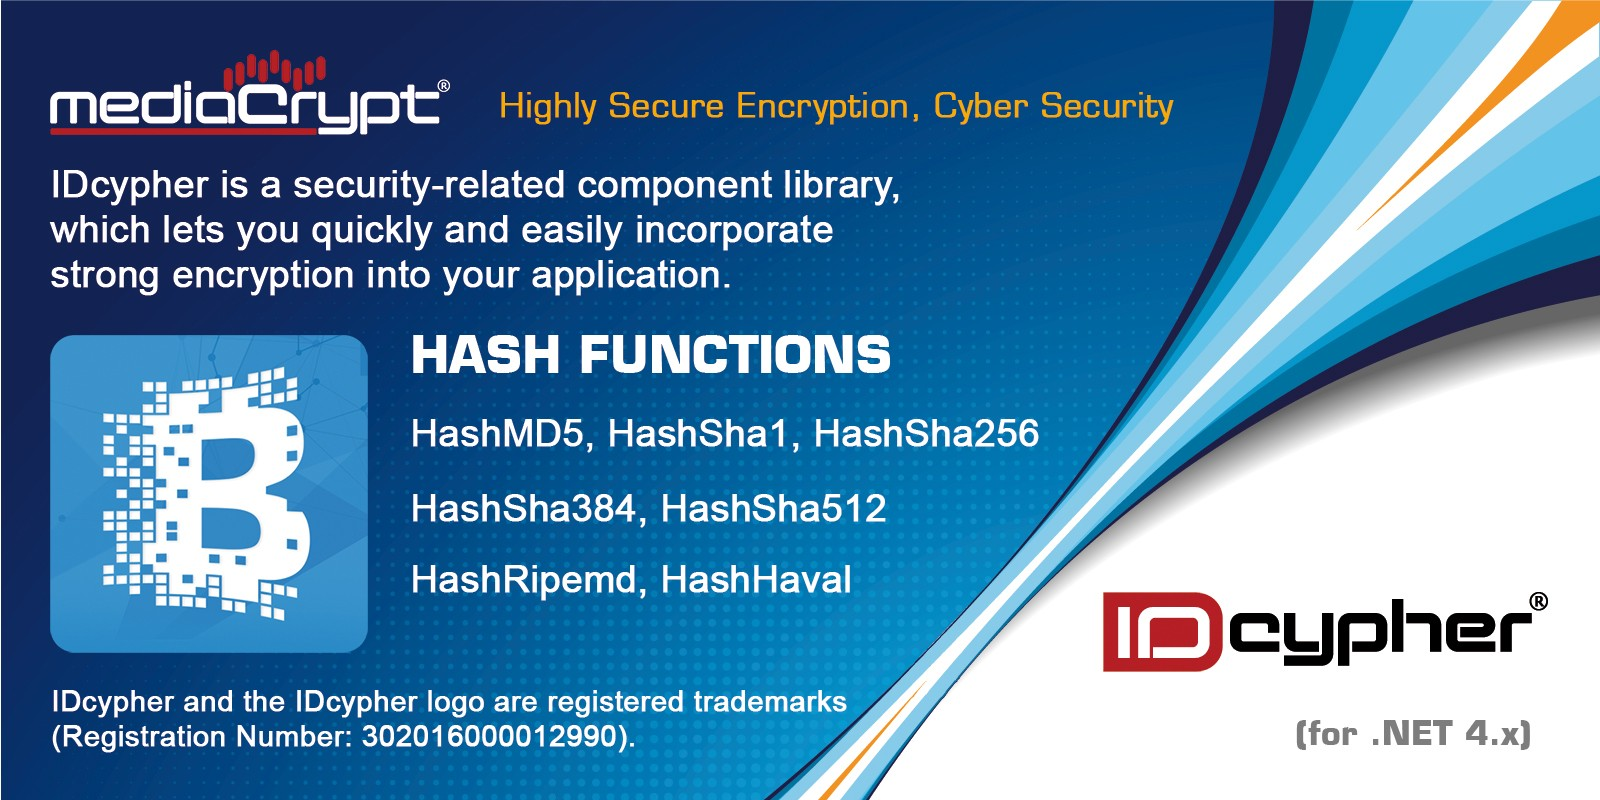 IDcypher Hash Functions .NET